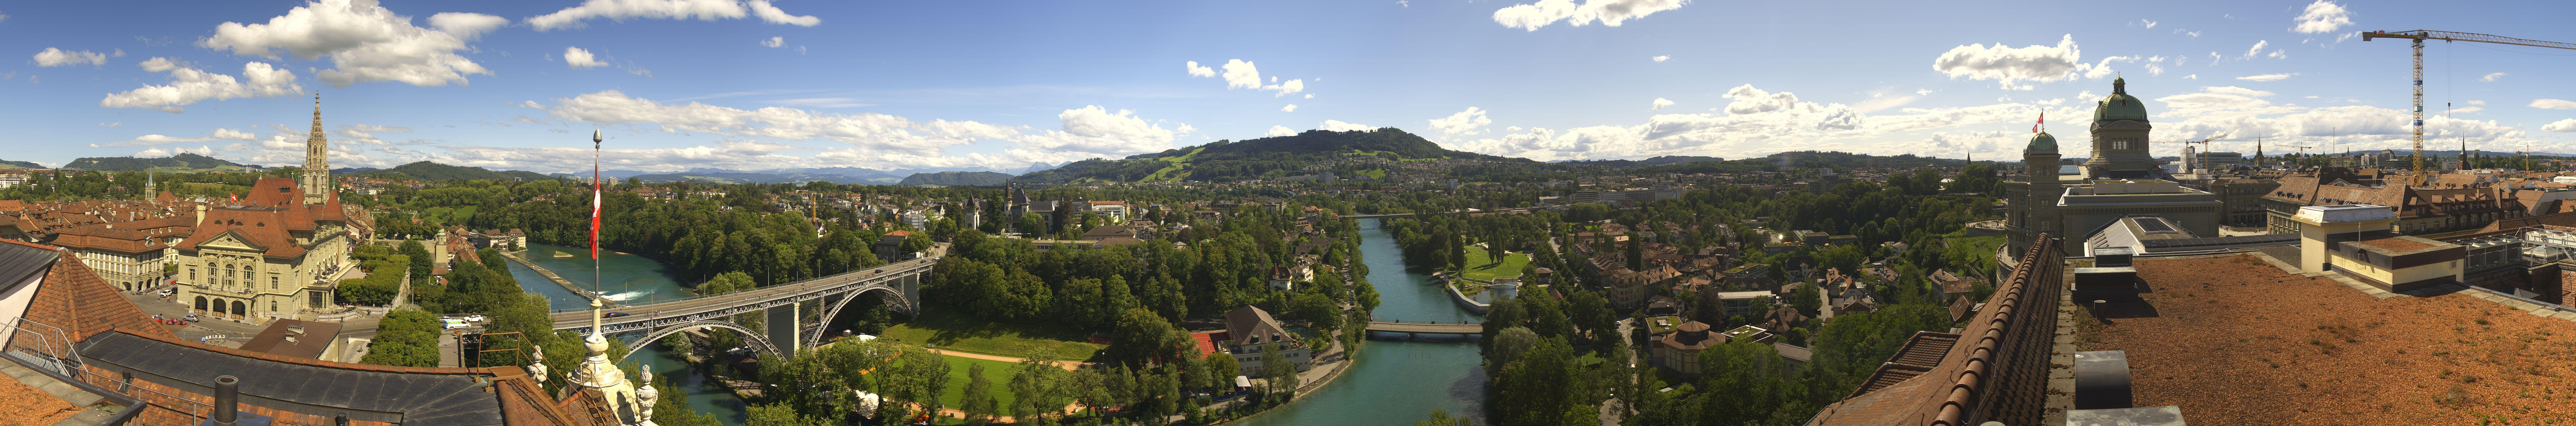 Bern: Bellevue Palace Bern